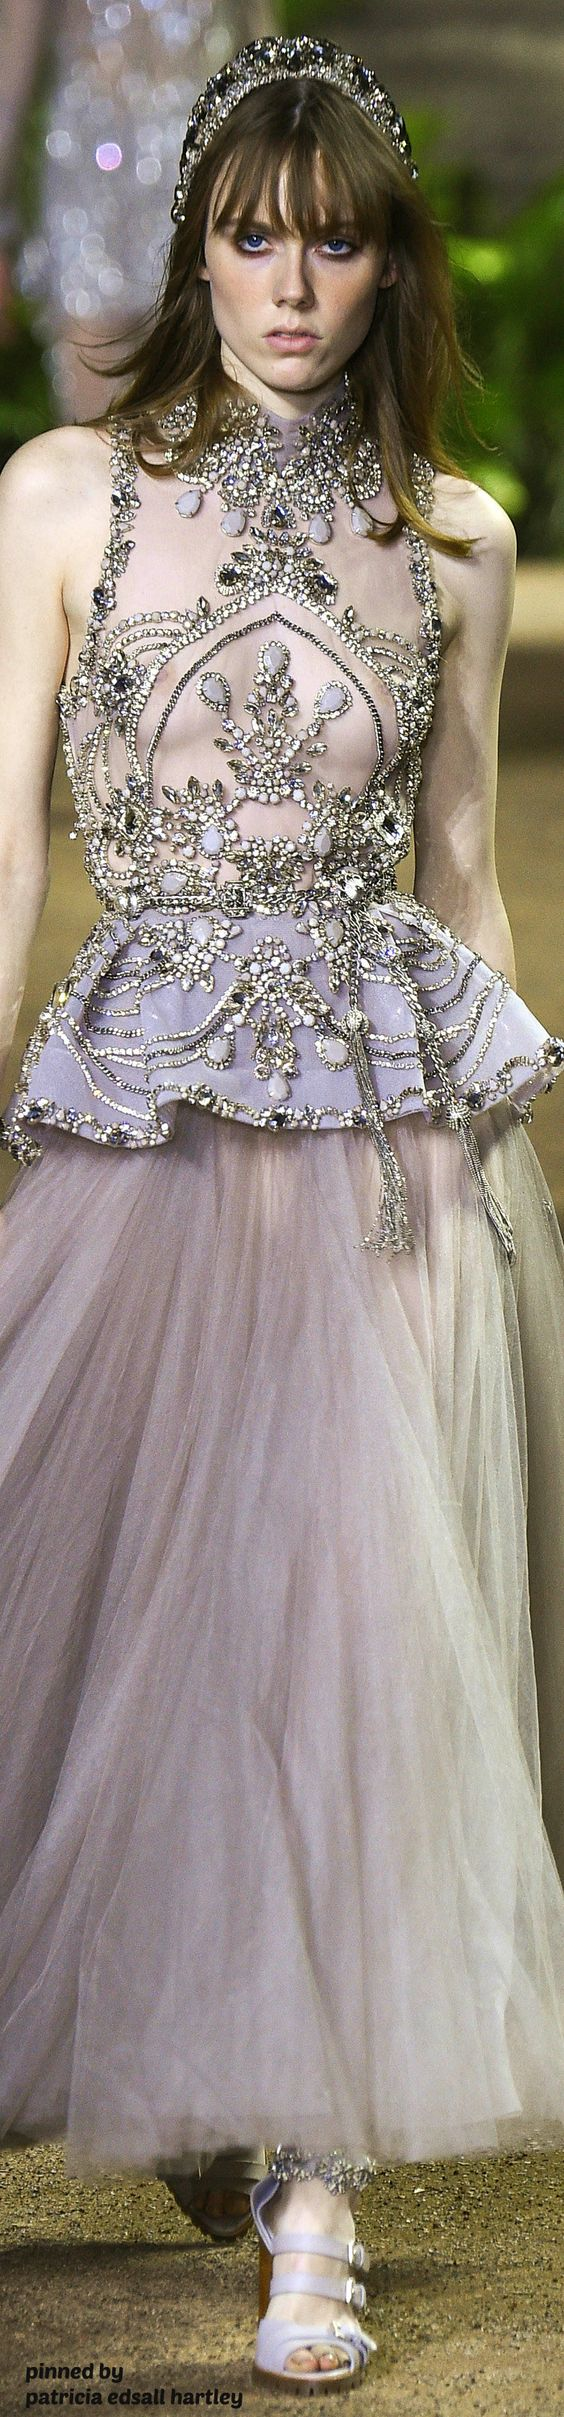 modelos-de-vestidos-de-noiva-coloridos